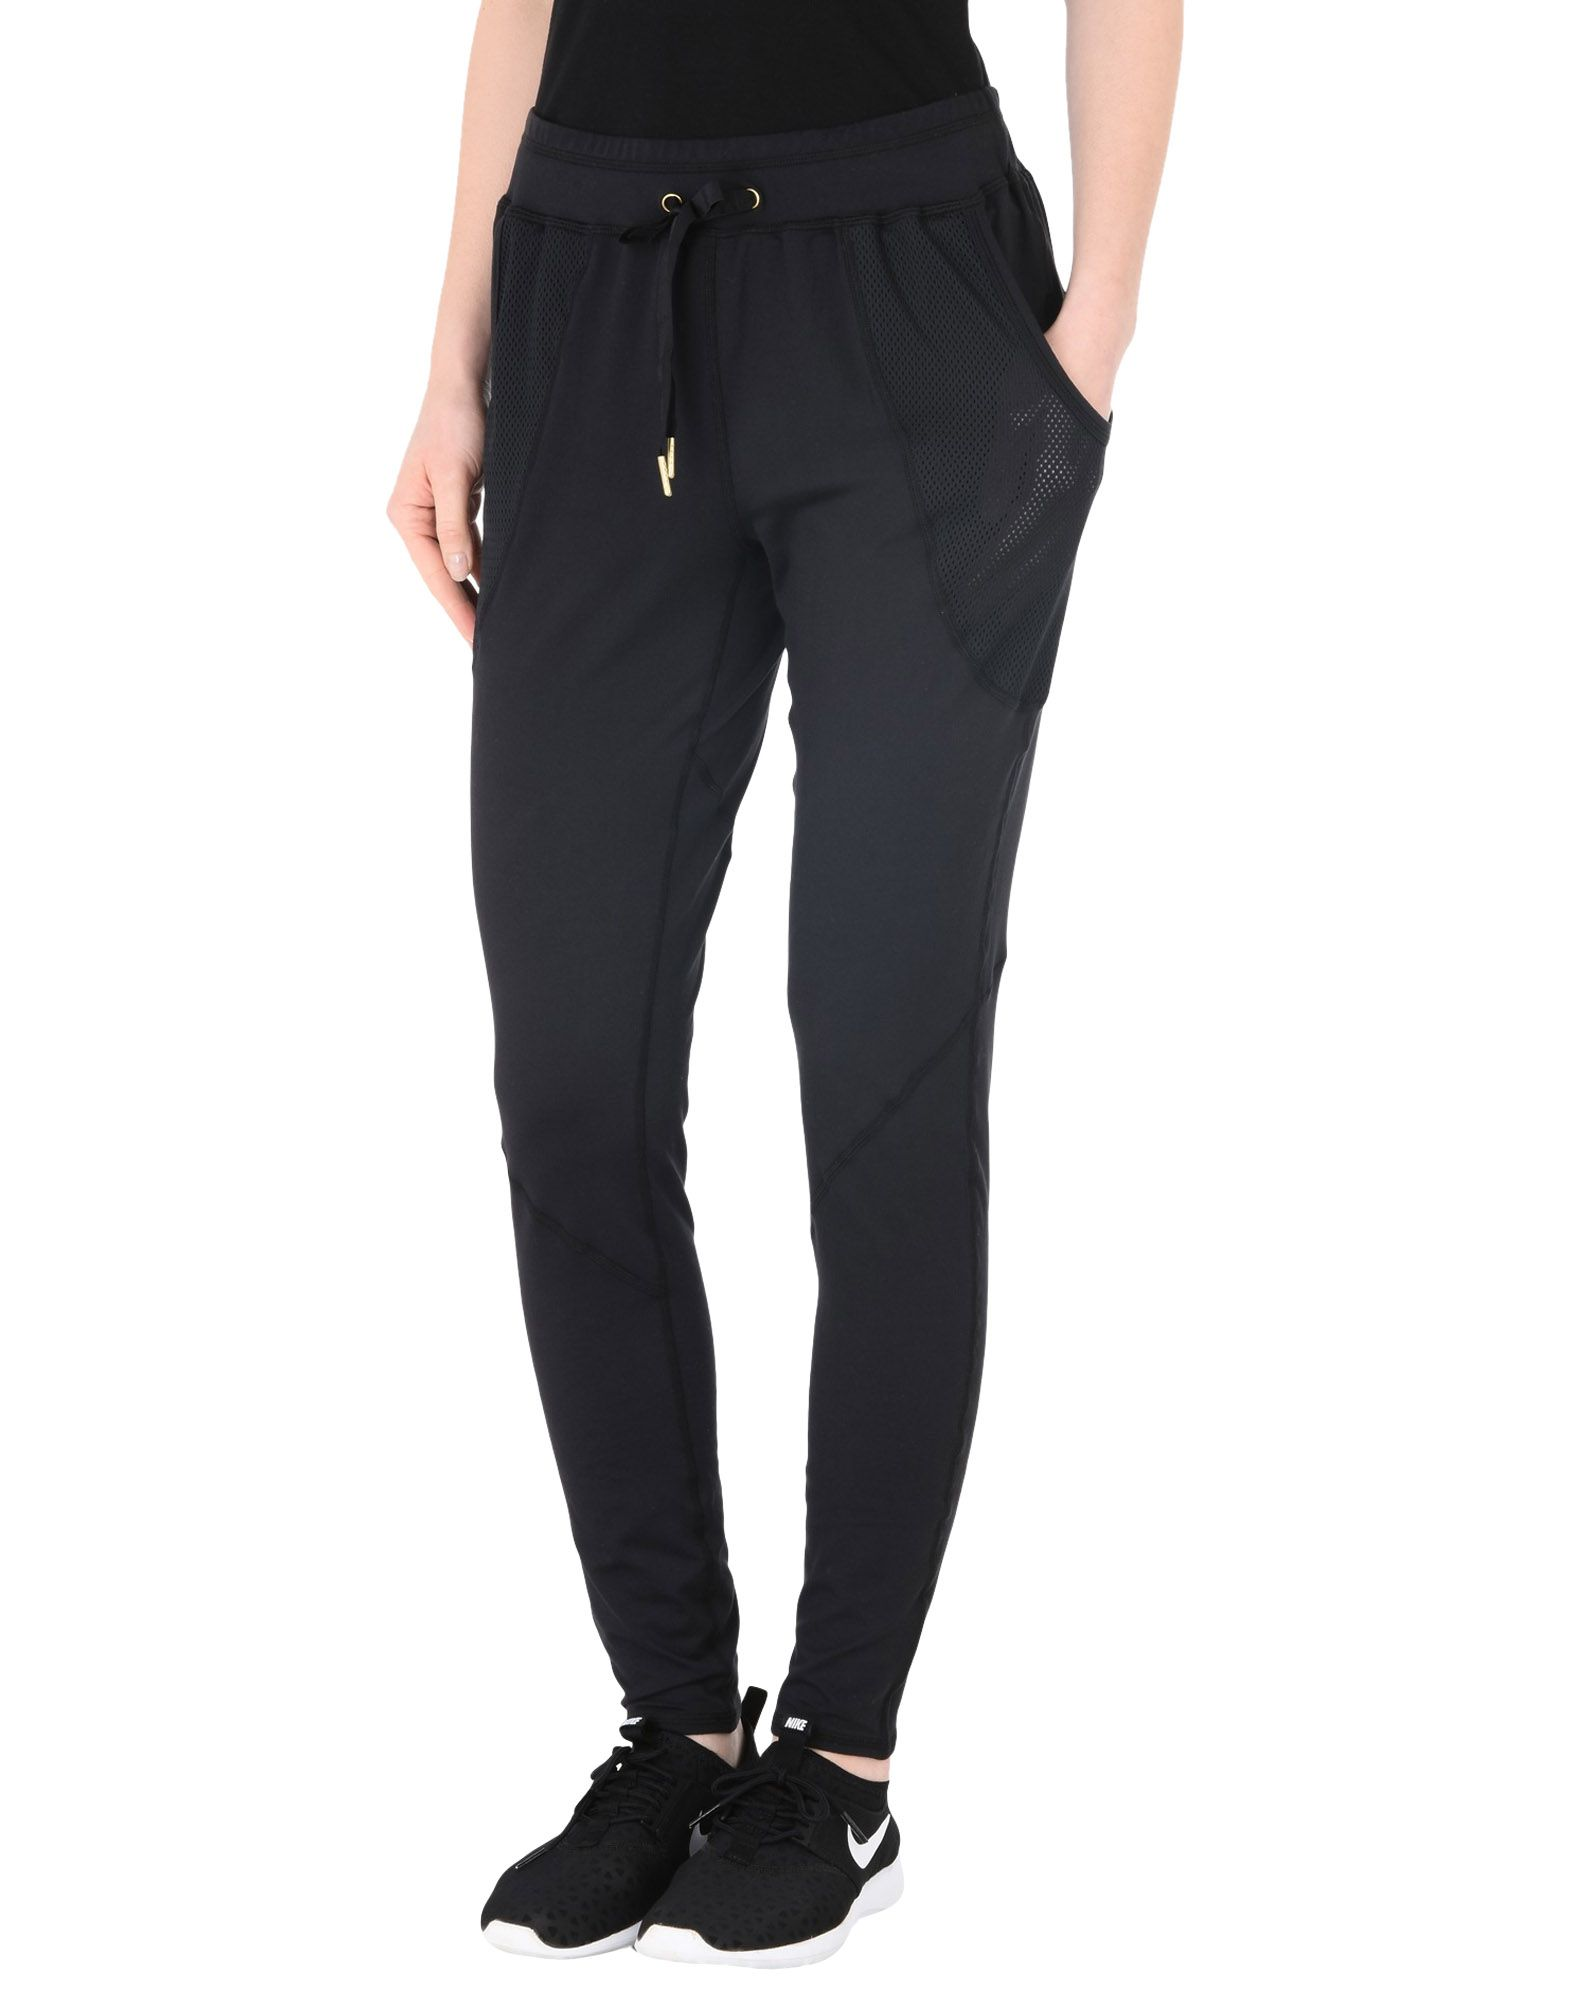 Pantalon À Acheter En Ligne JerseyFemmes Alala 15F3uTKlJc